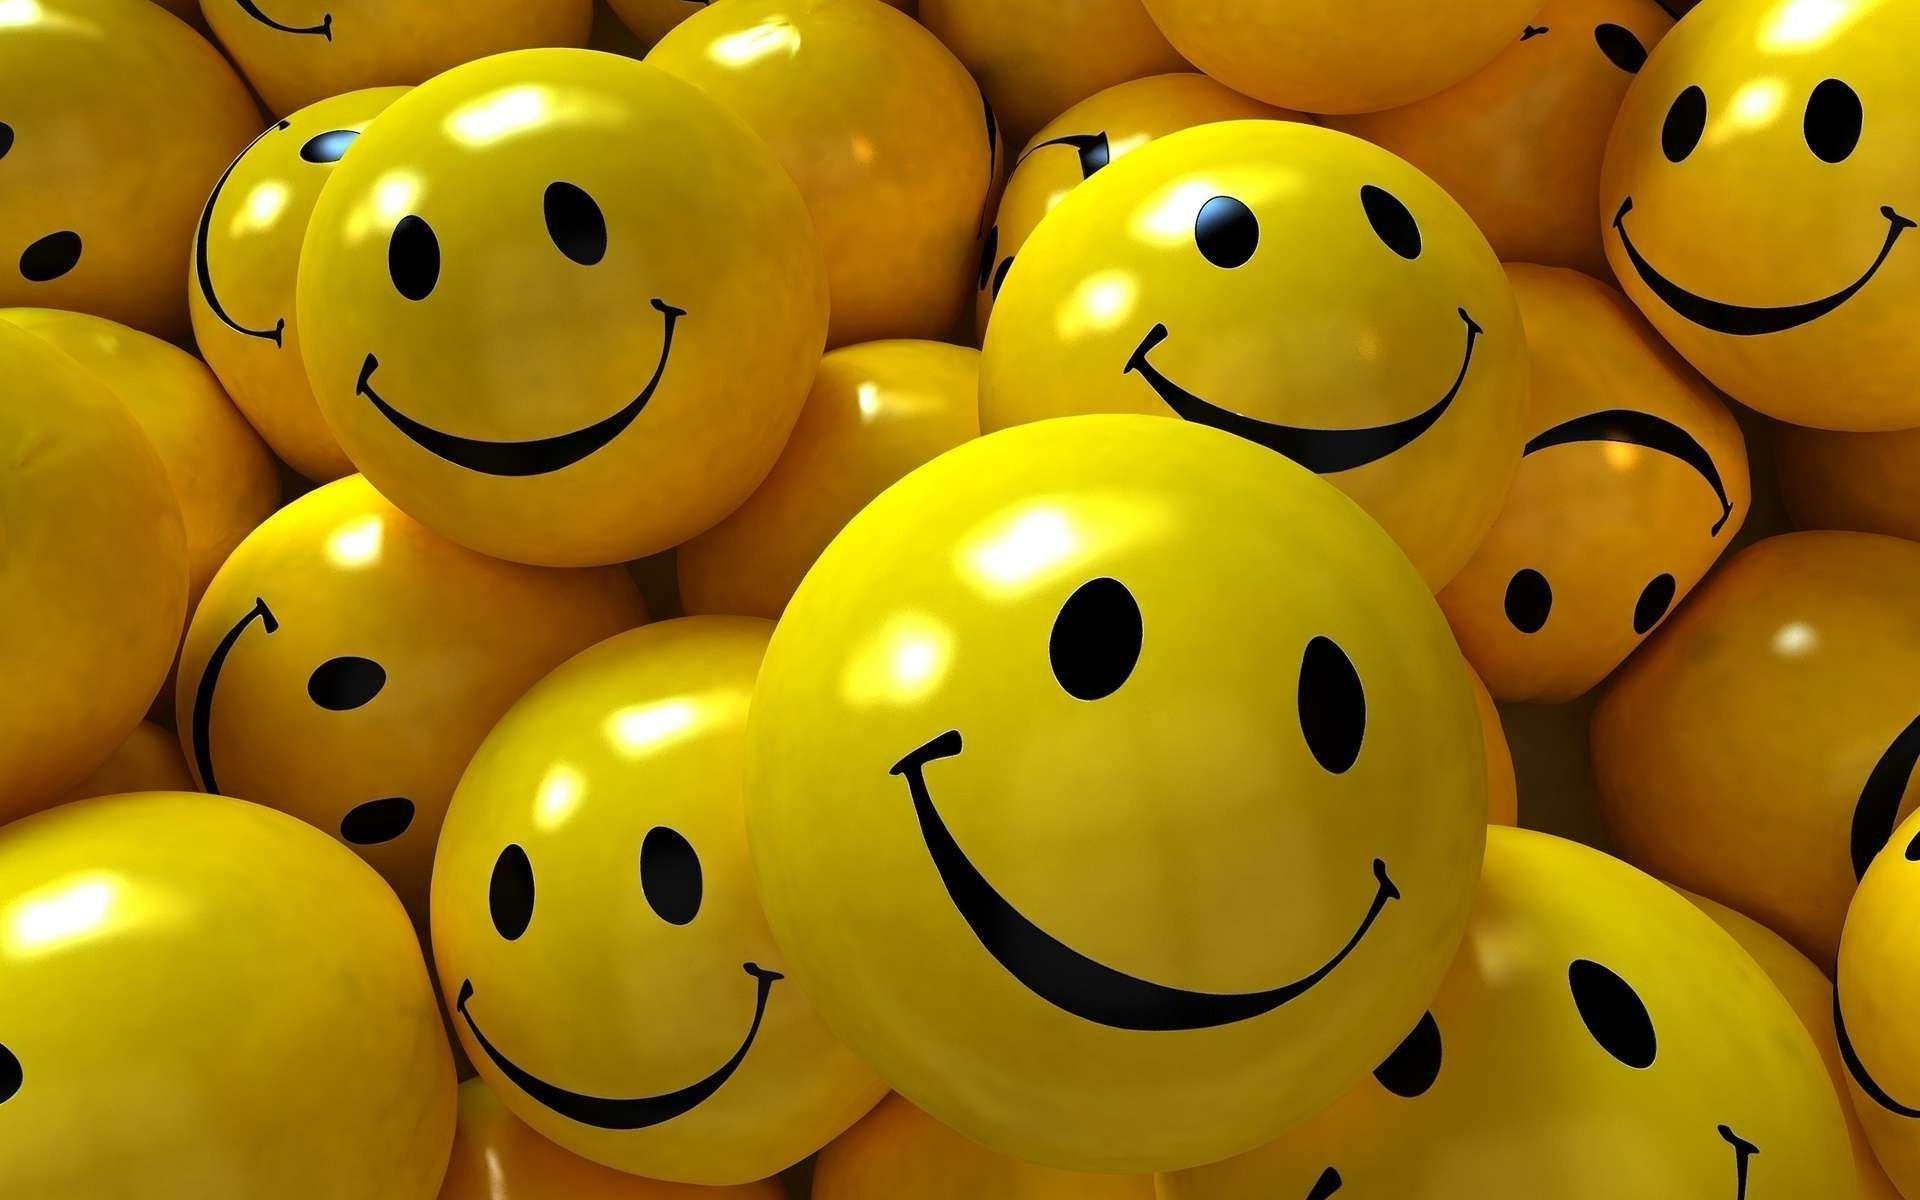 Wallpaper-Of-Smiley-Faces-15.jpg